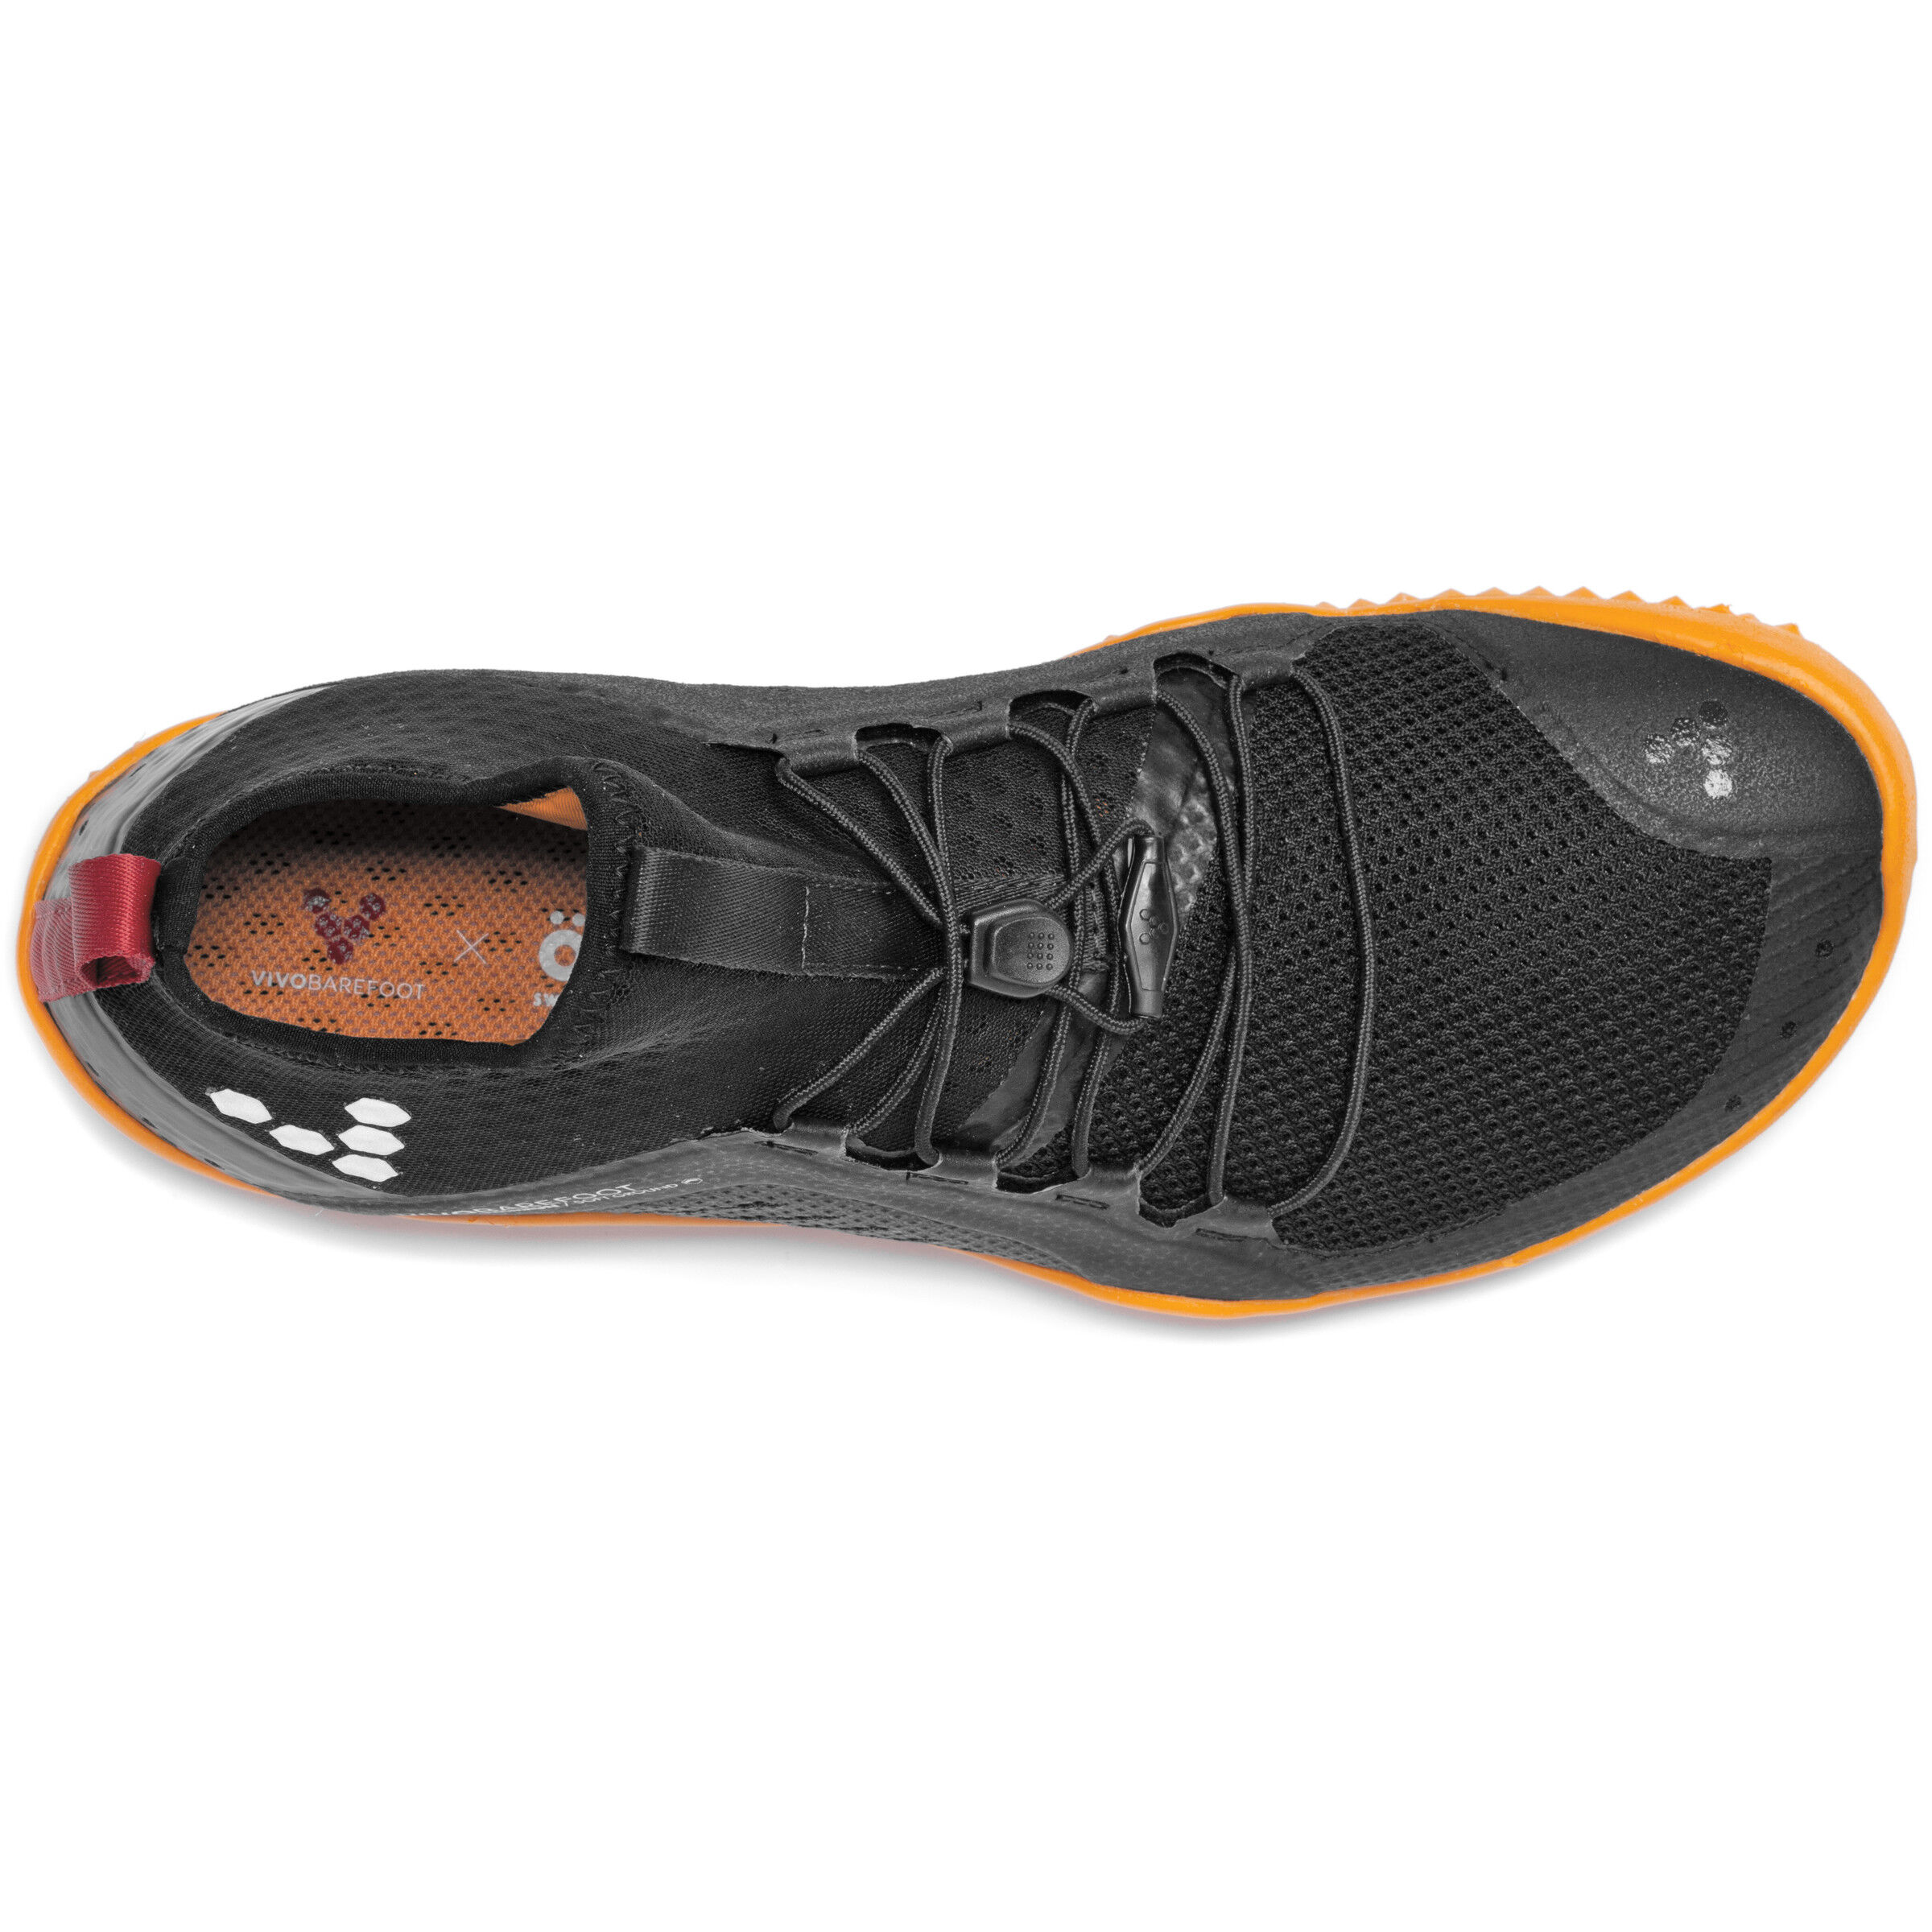 Sg Swimrun Primus Mesh Boots Vivobarefoot Damen bgf76y